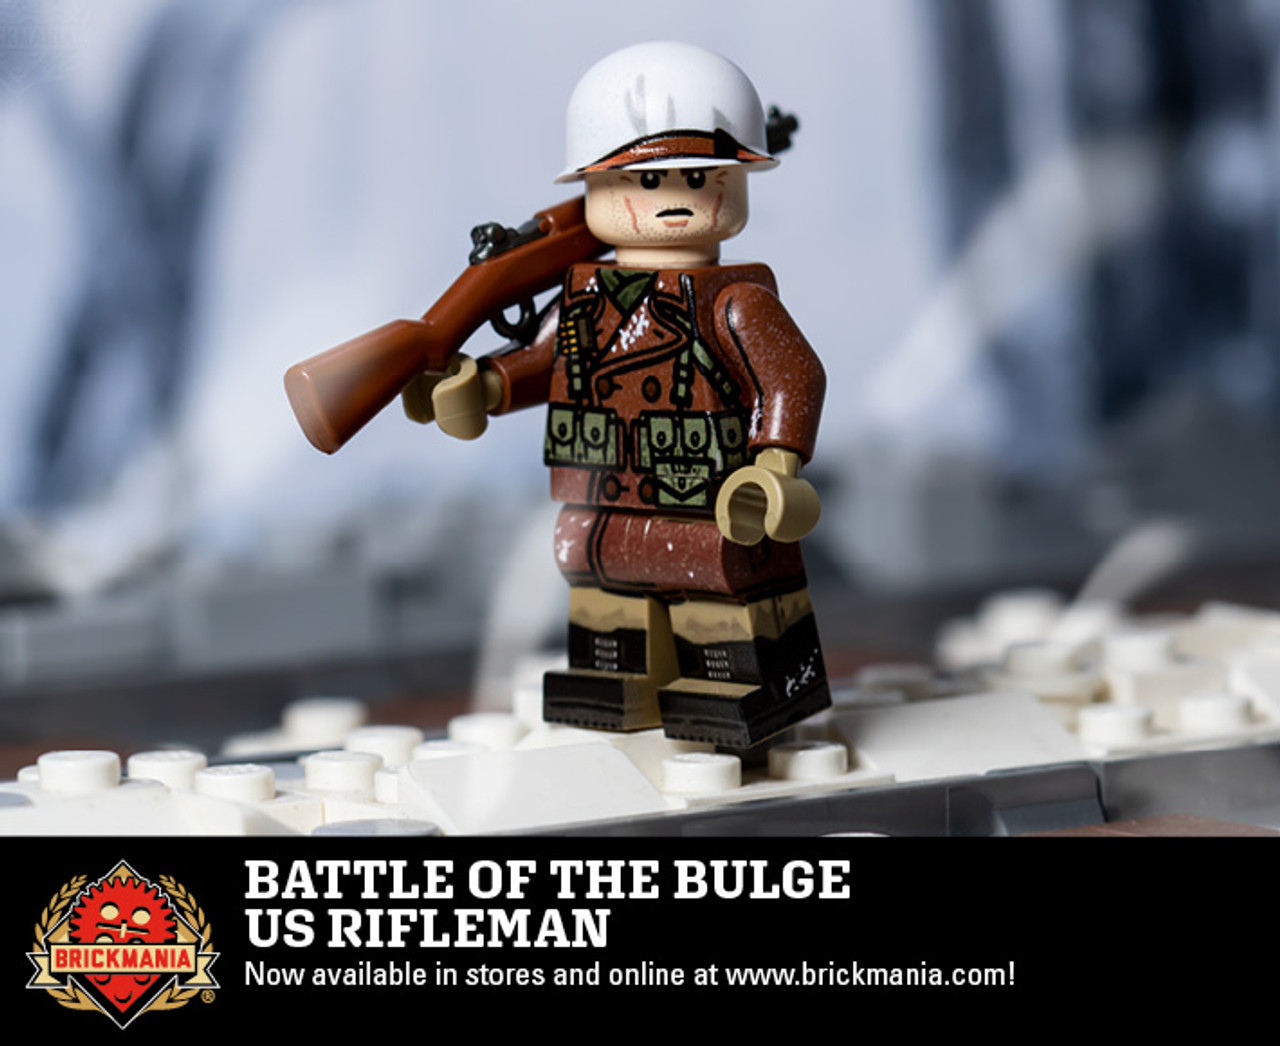 Battle of the Bulge U.S. Rifleman